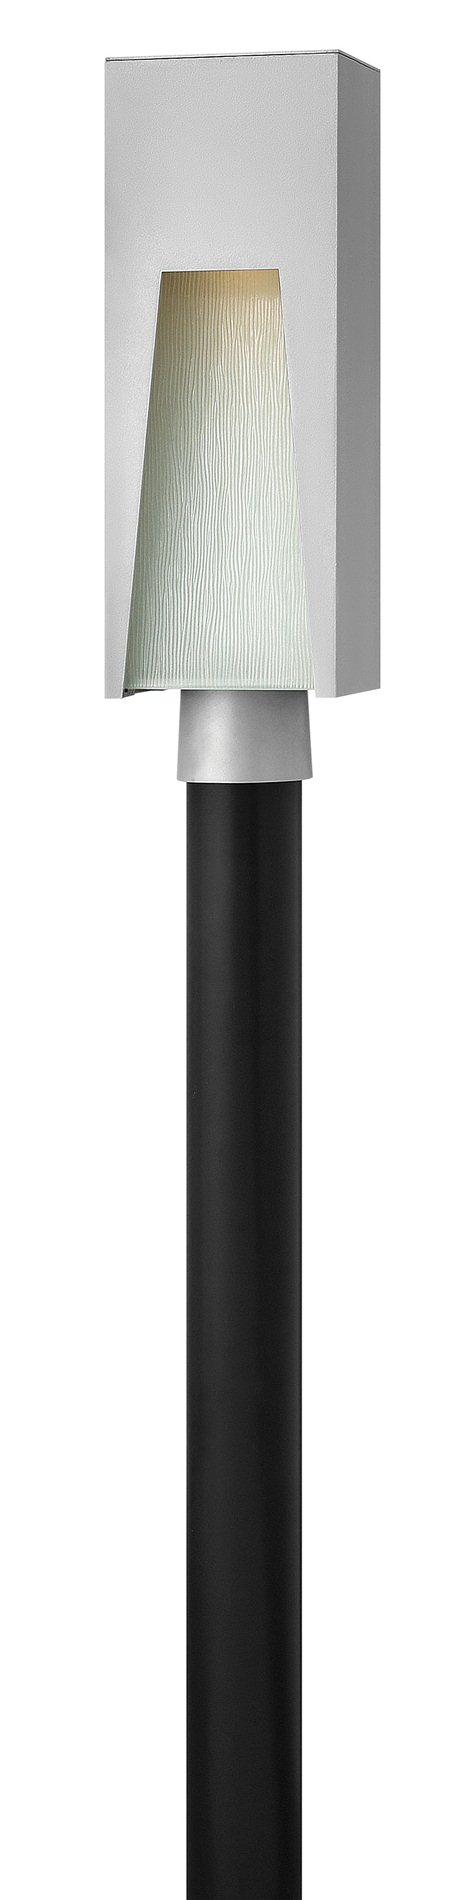 Hinkley Lighting 1761TT Kube Modern Contemporary Outdoor Post Lantern Light